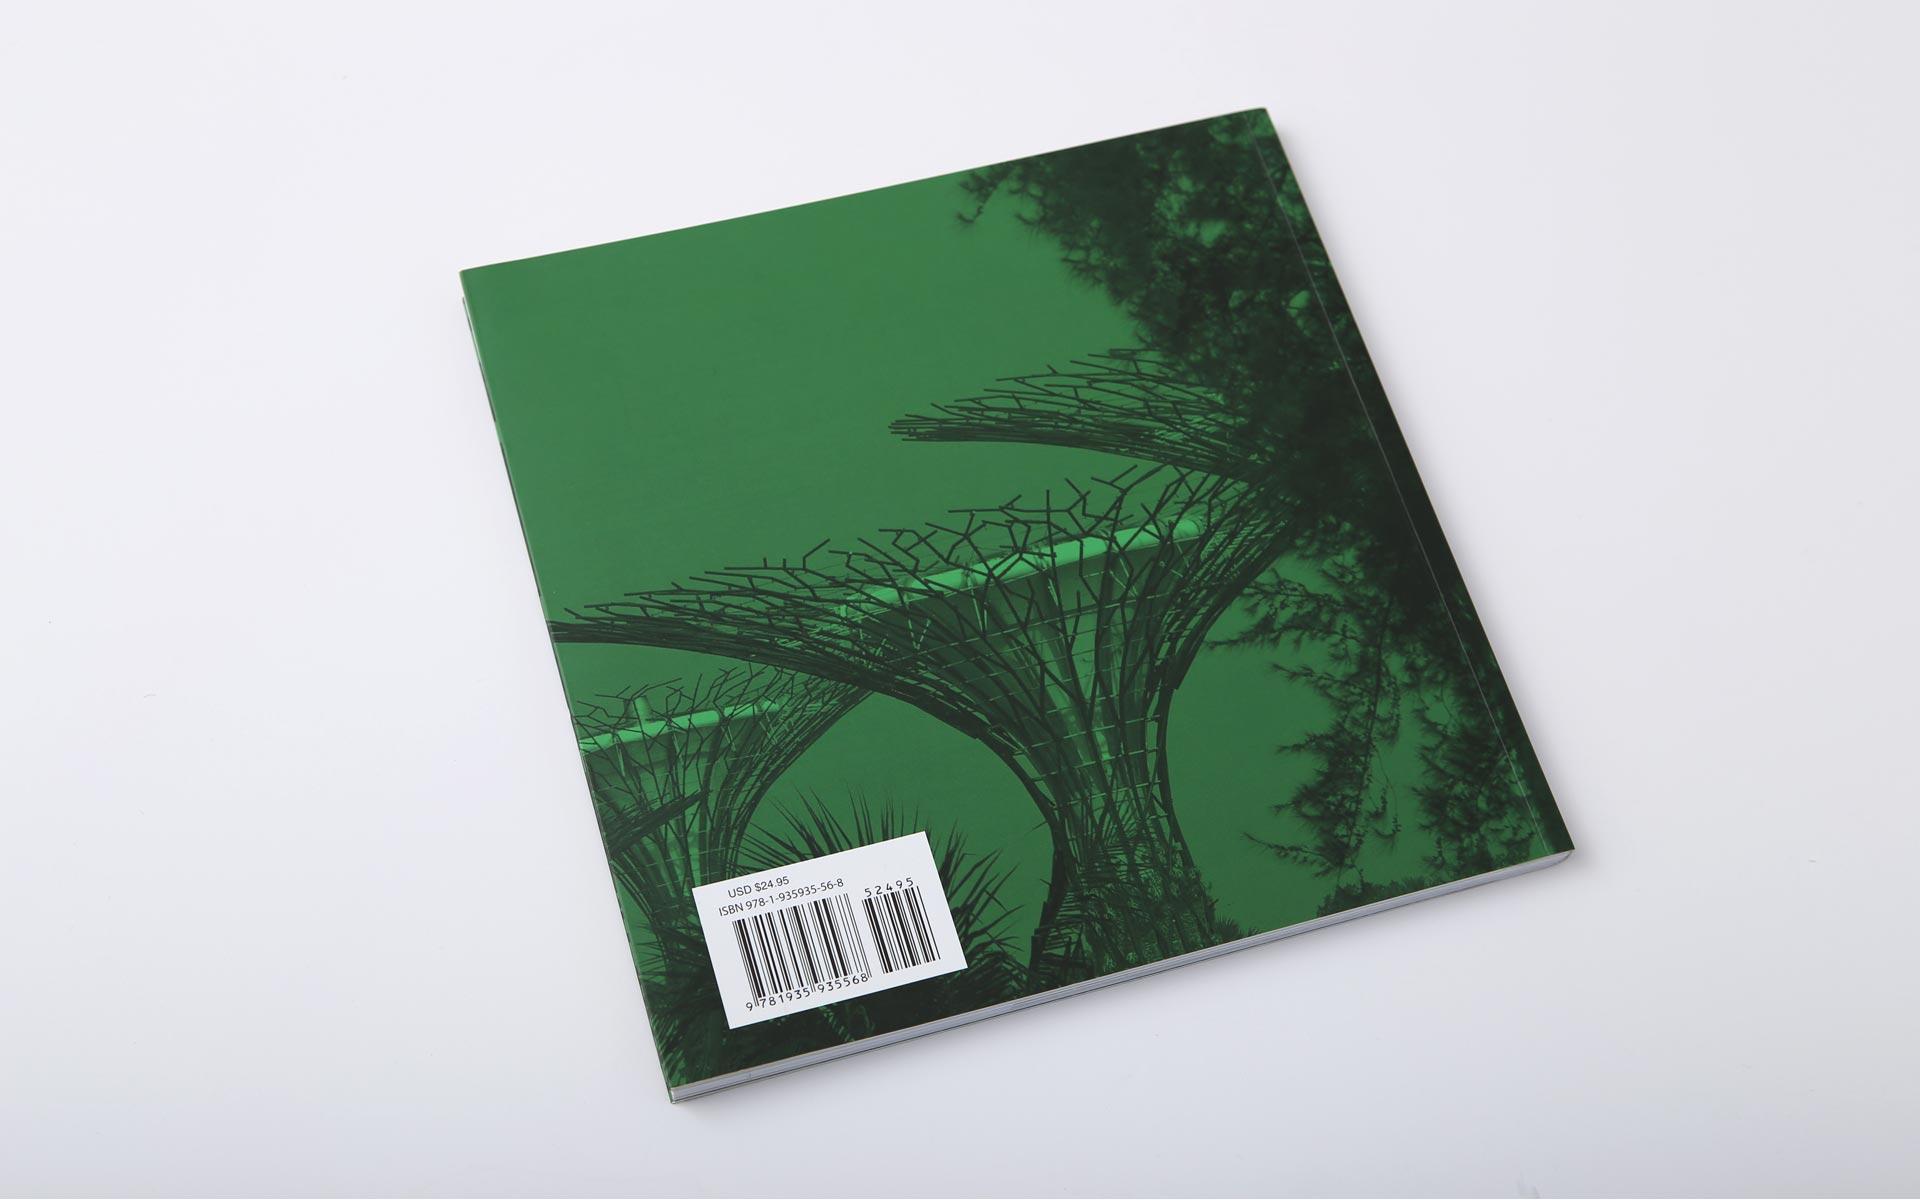 atelier-ten-book-design-2